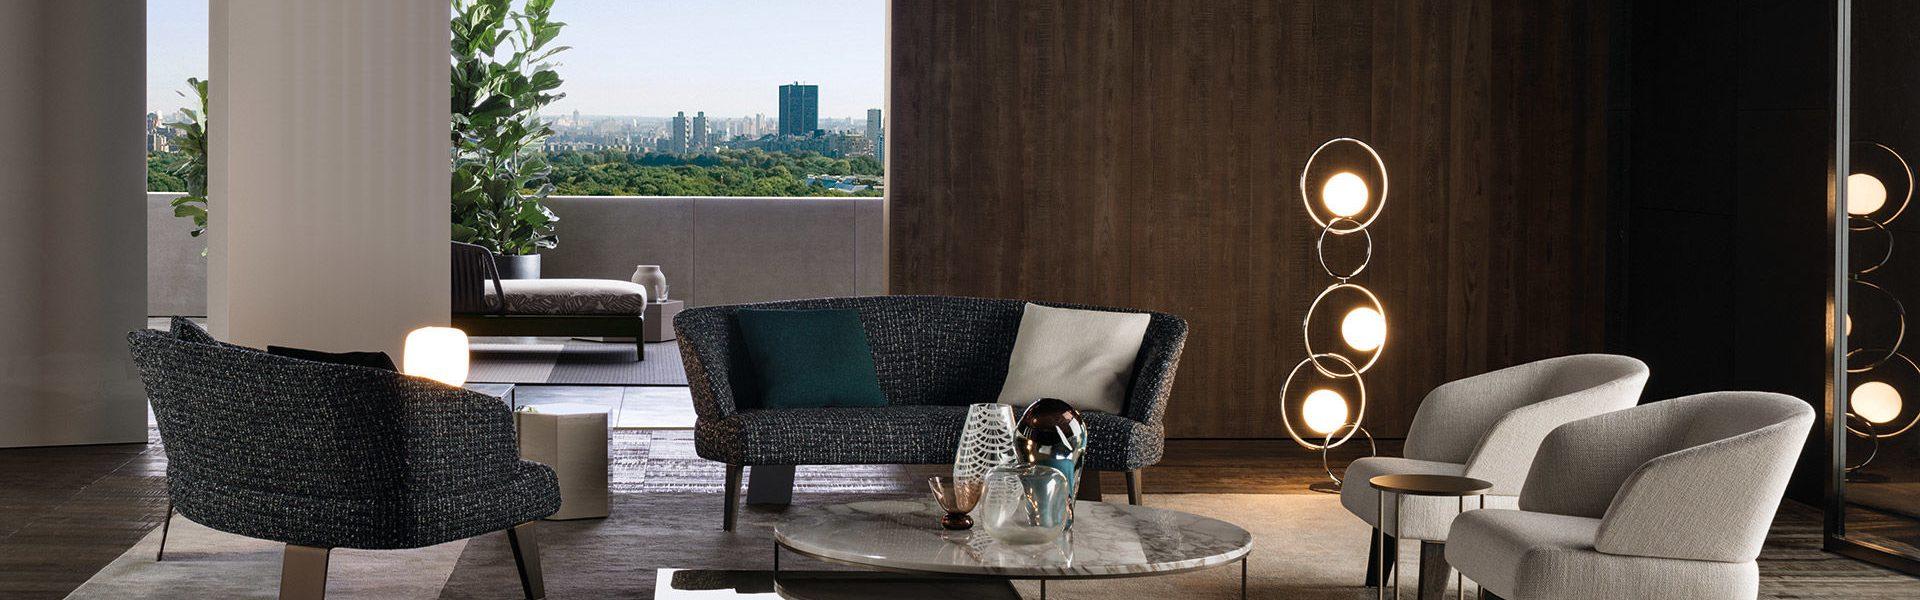 Reeves Semi-round Lounge Sofa